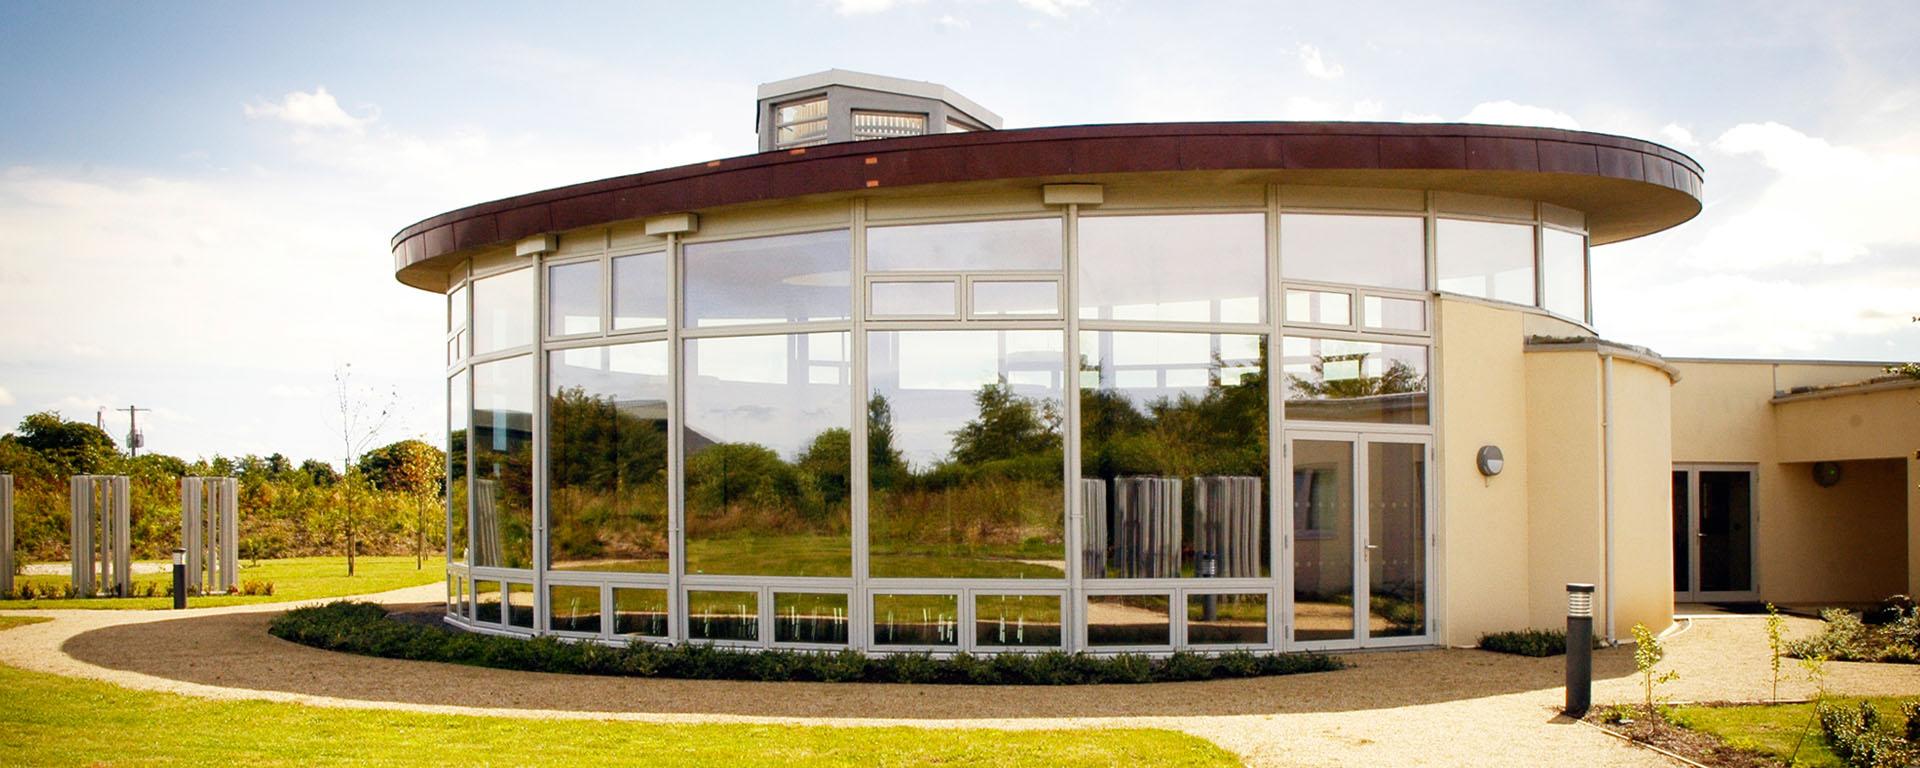 Christian Spirituality Centre Kildare on Pilgrimage